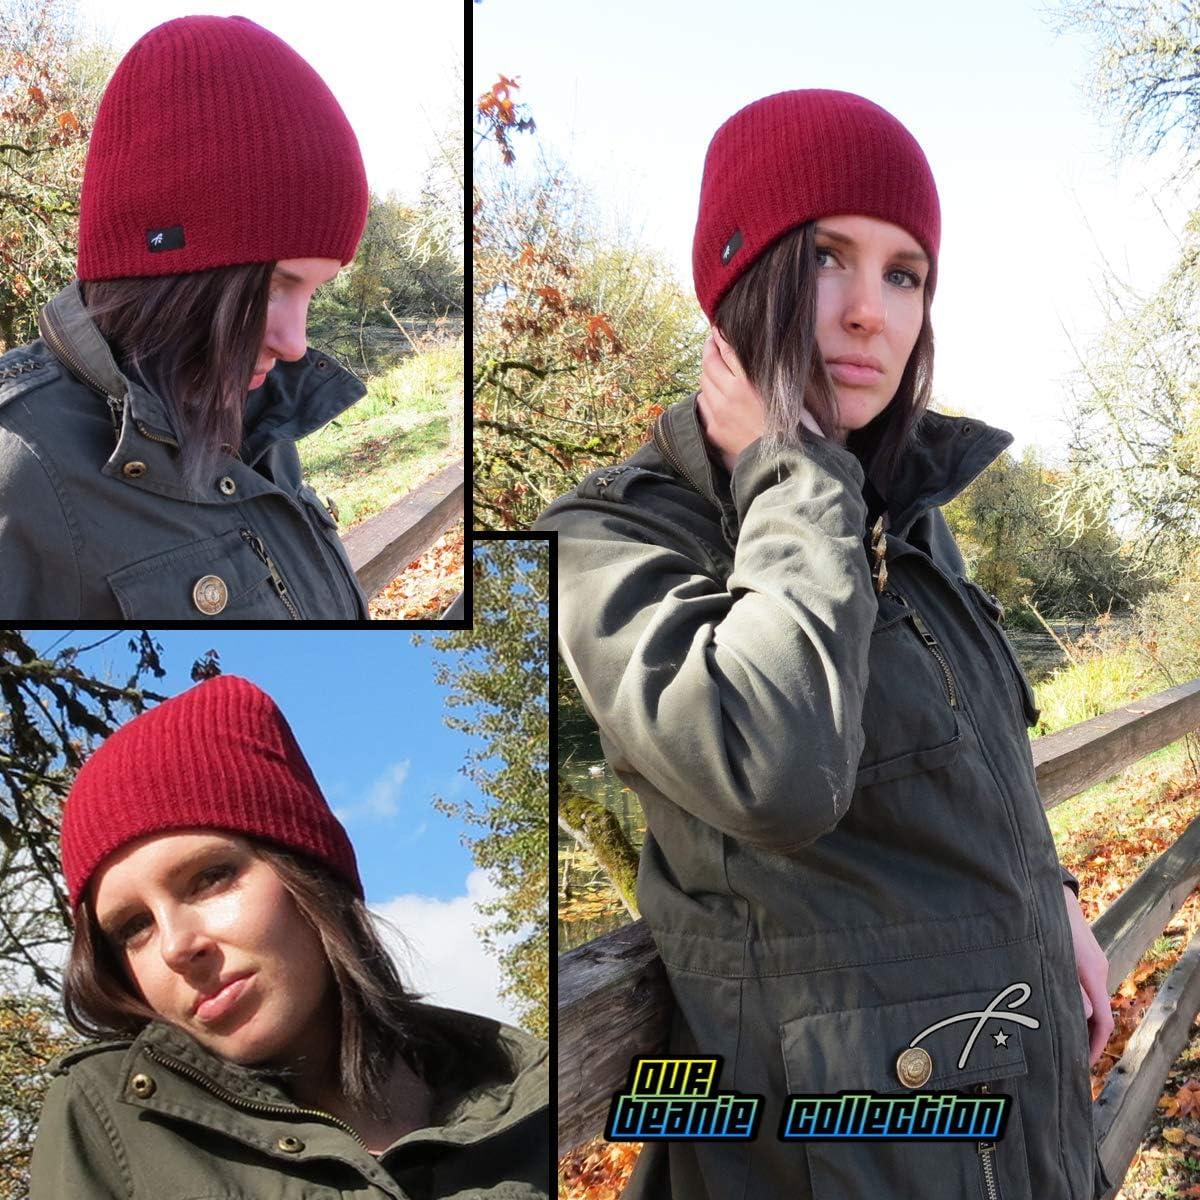 Grace Folly Daily Beanie Hat Skull Cap for Men Women Many Colors